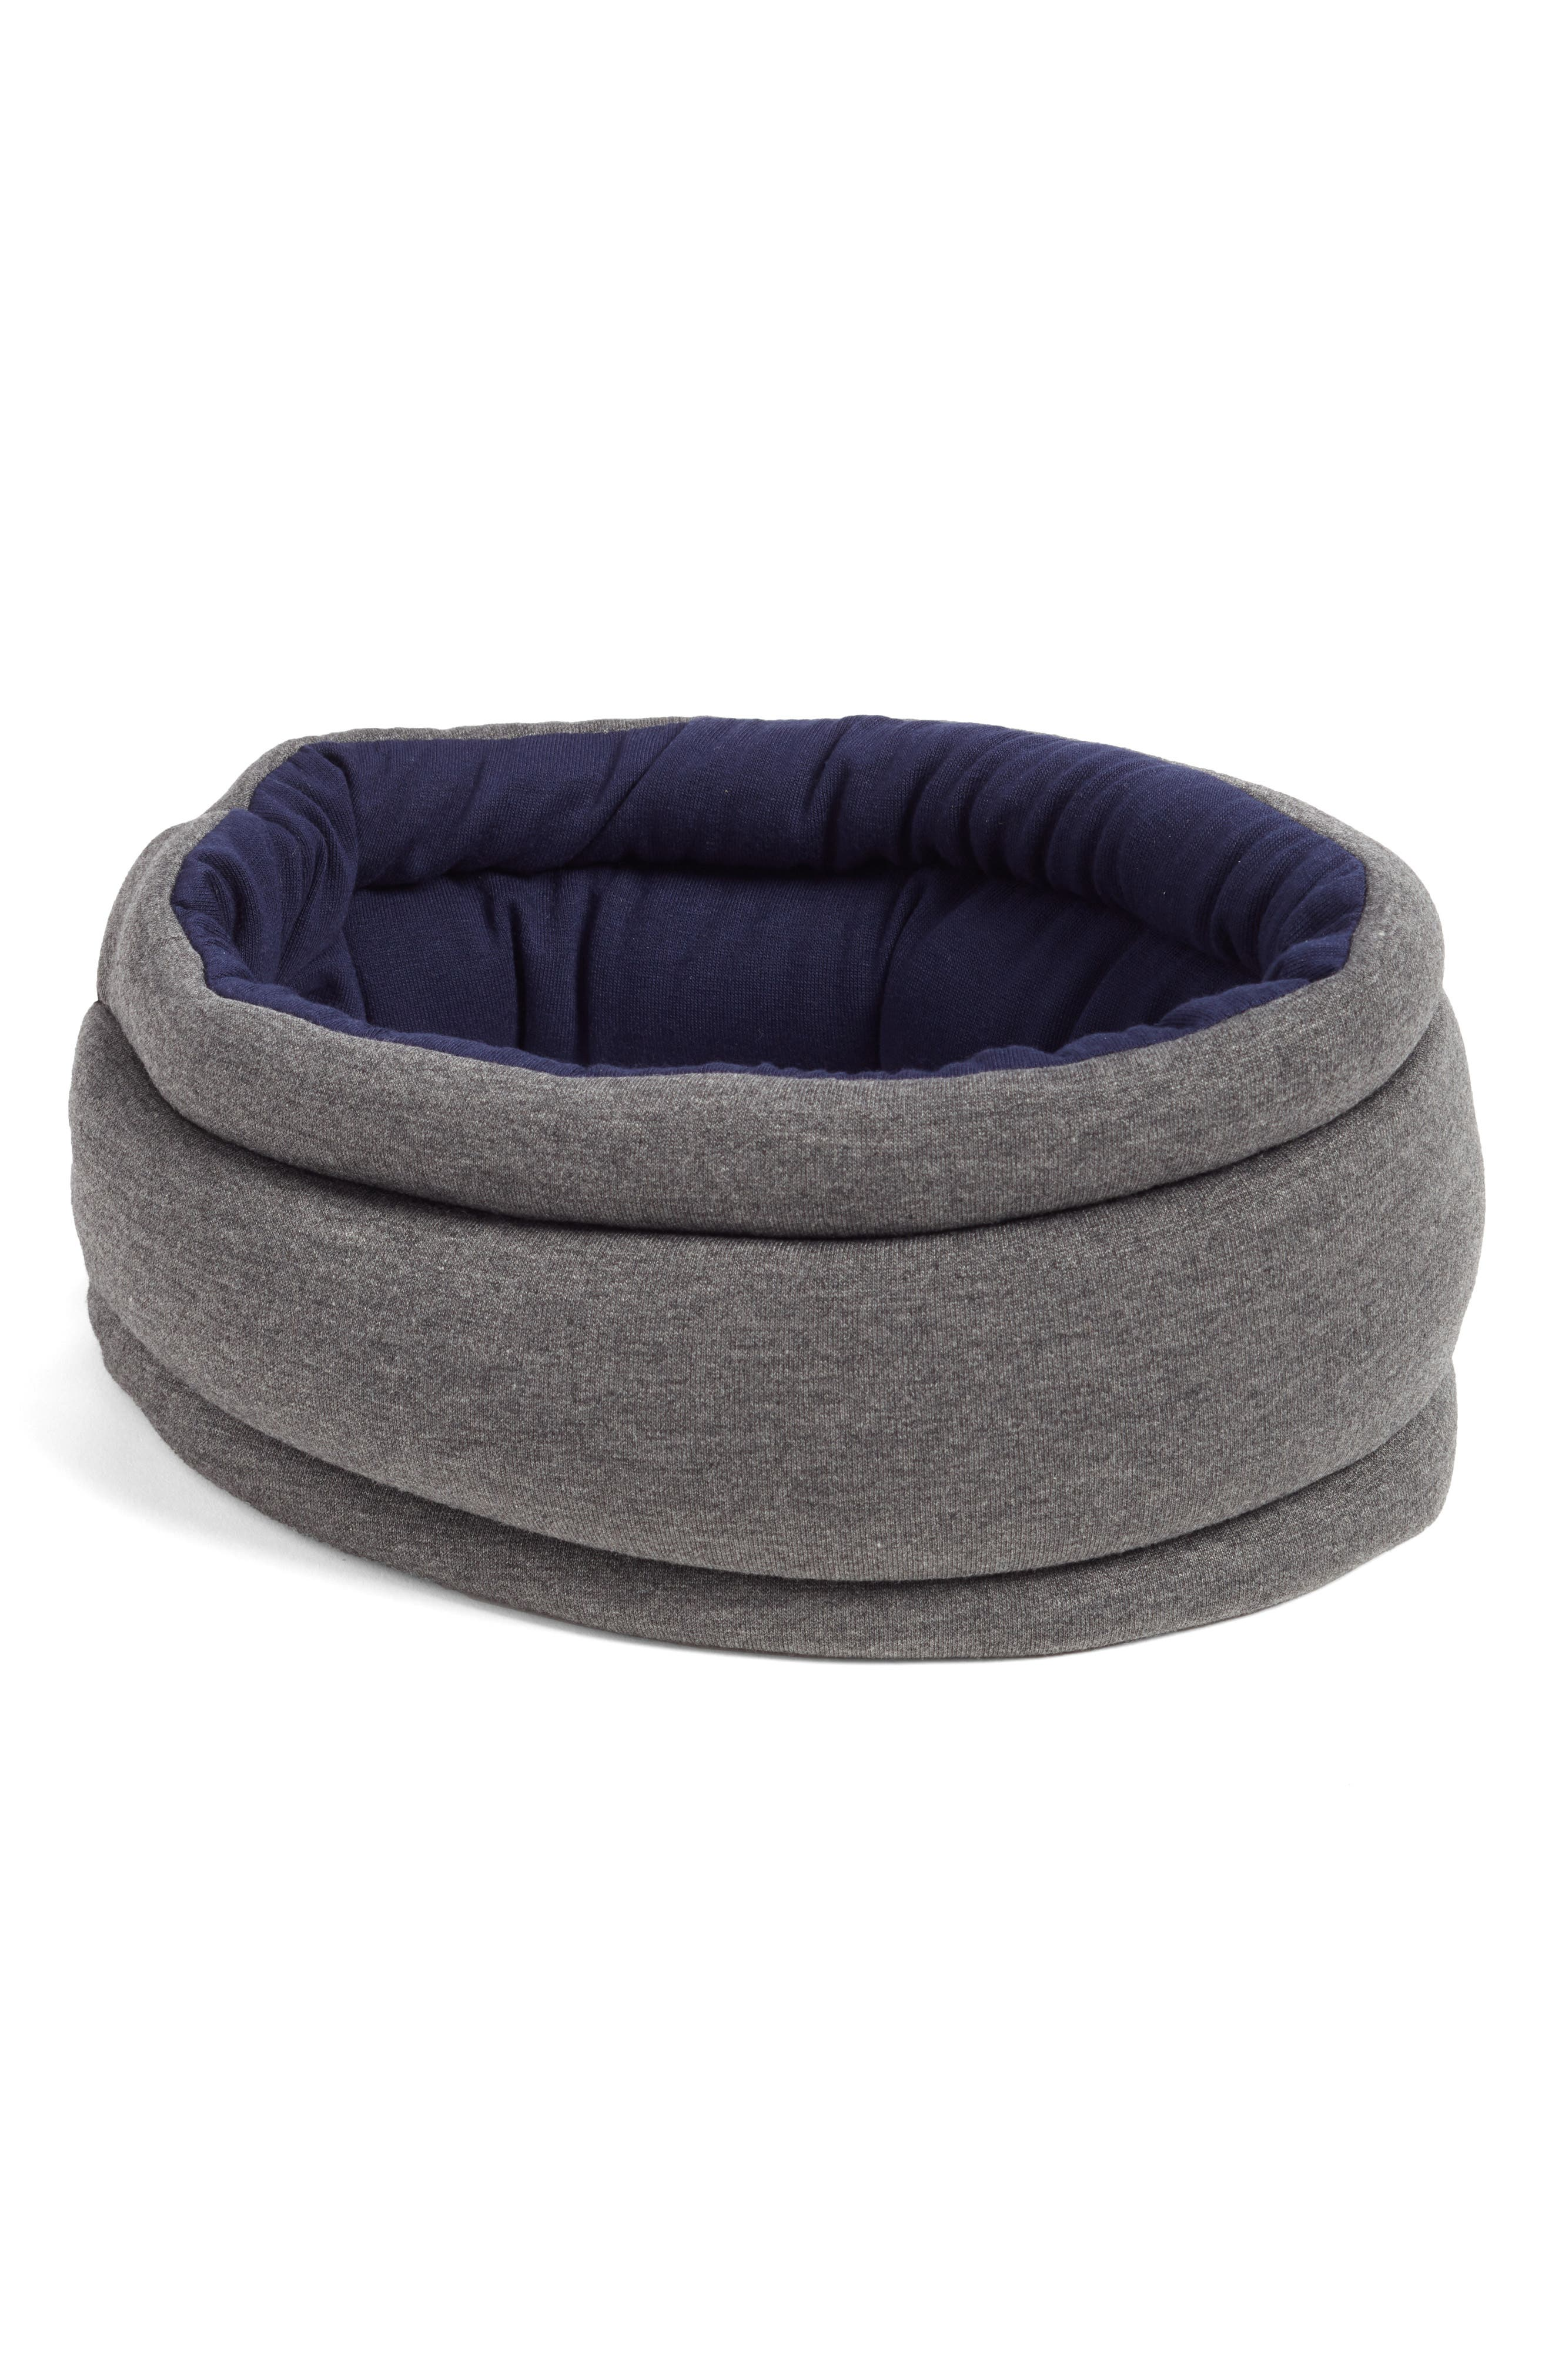 OSTRICHPILLOW<sup>®</sup> Light Reversible Travel Pillow,                             Alternate thumbnail 2, color,                             MOONLIGHT BLUE